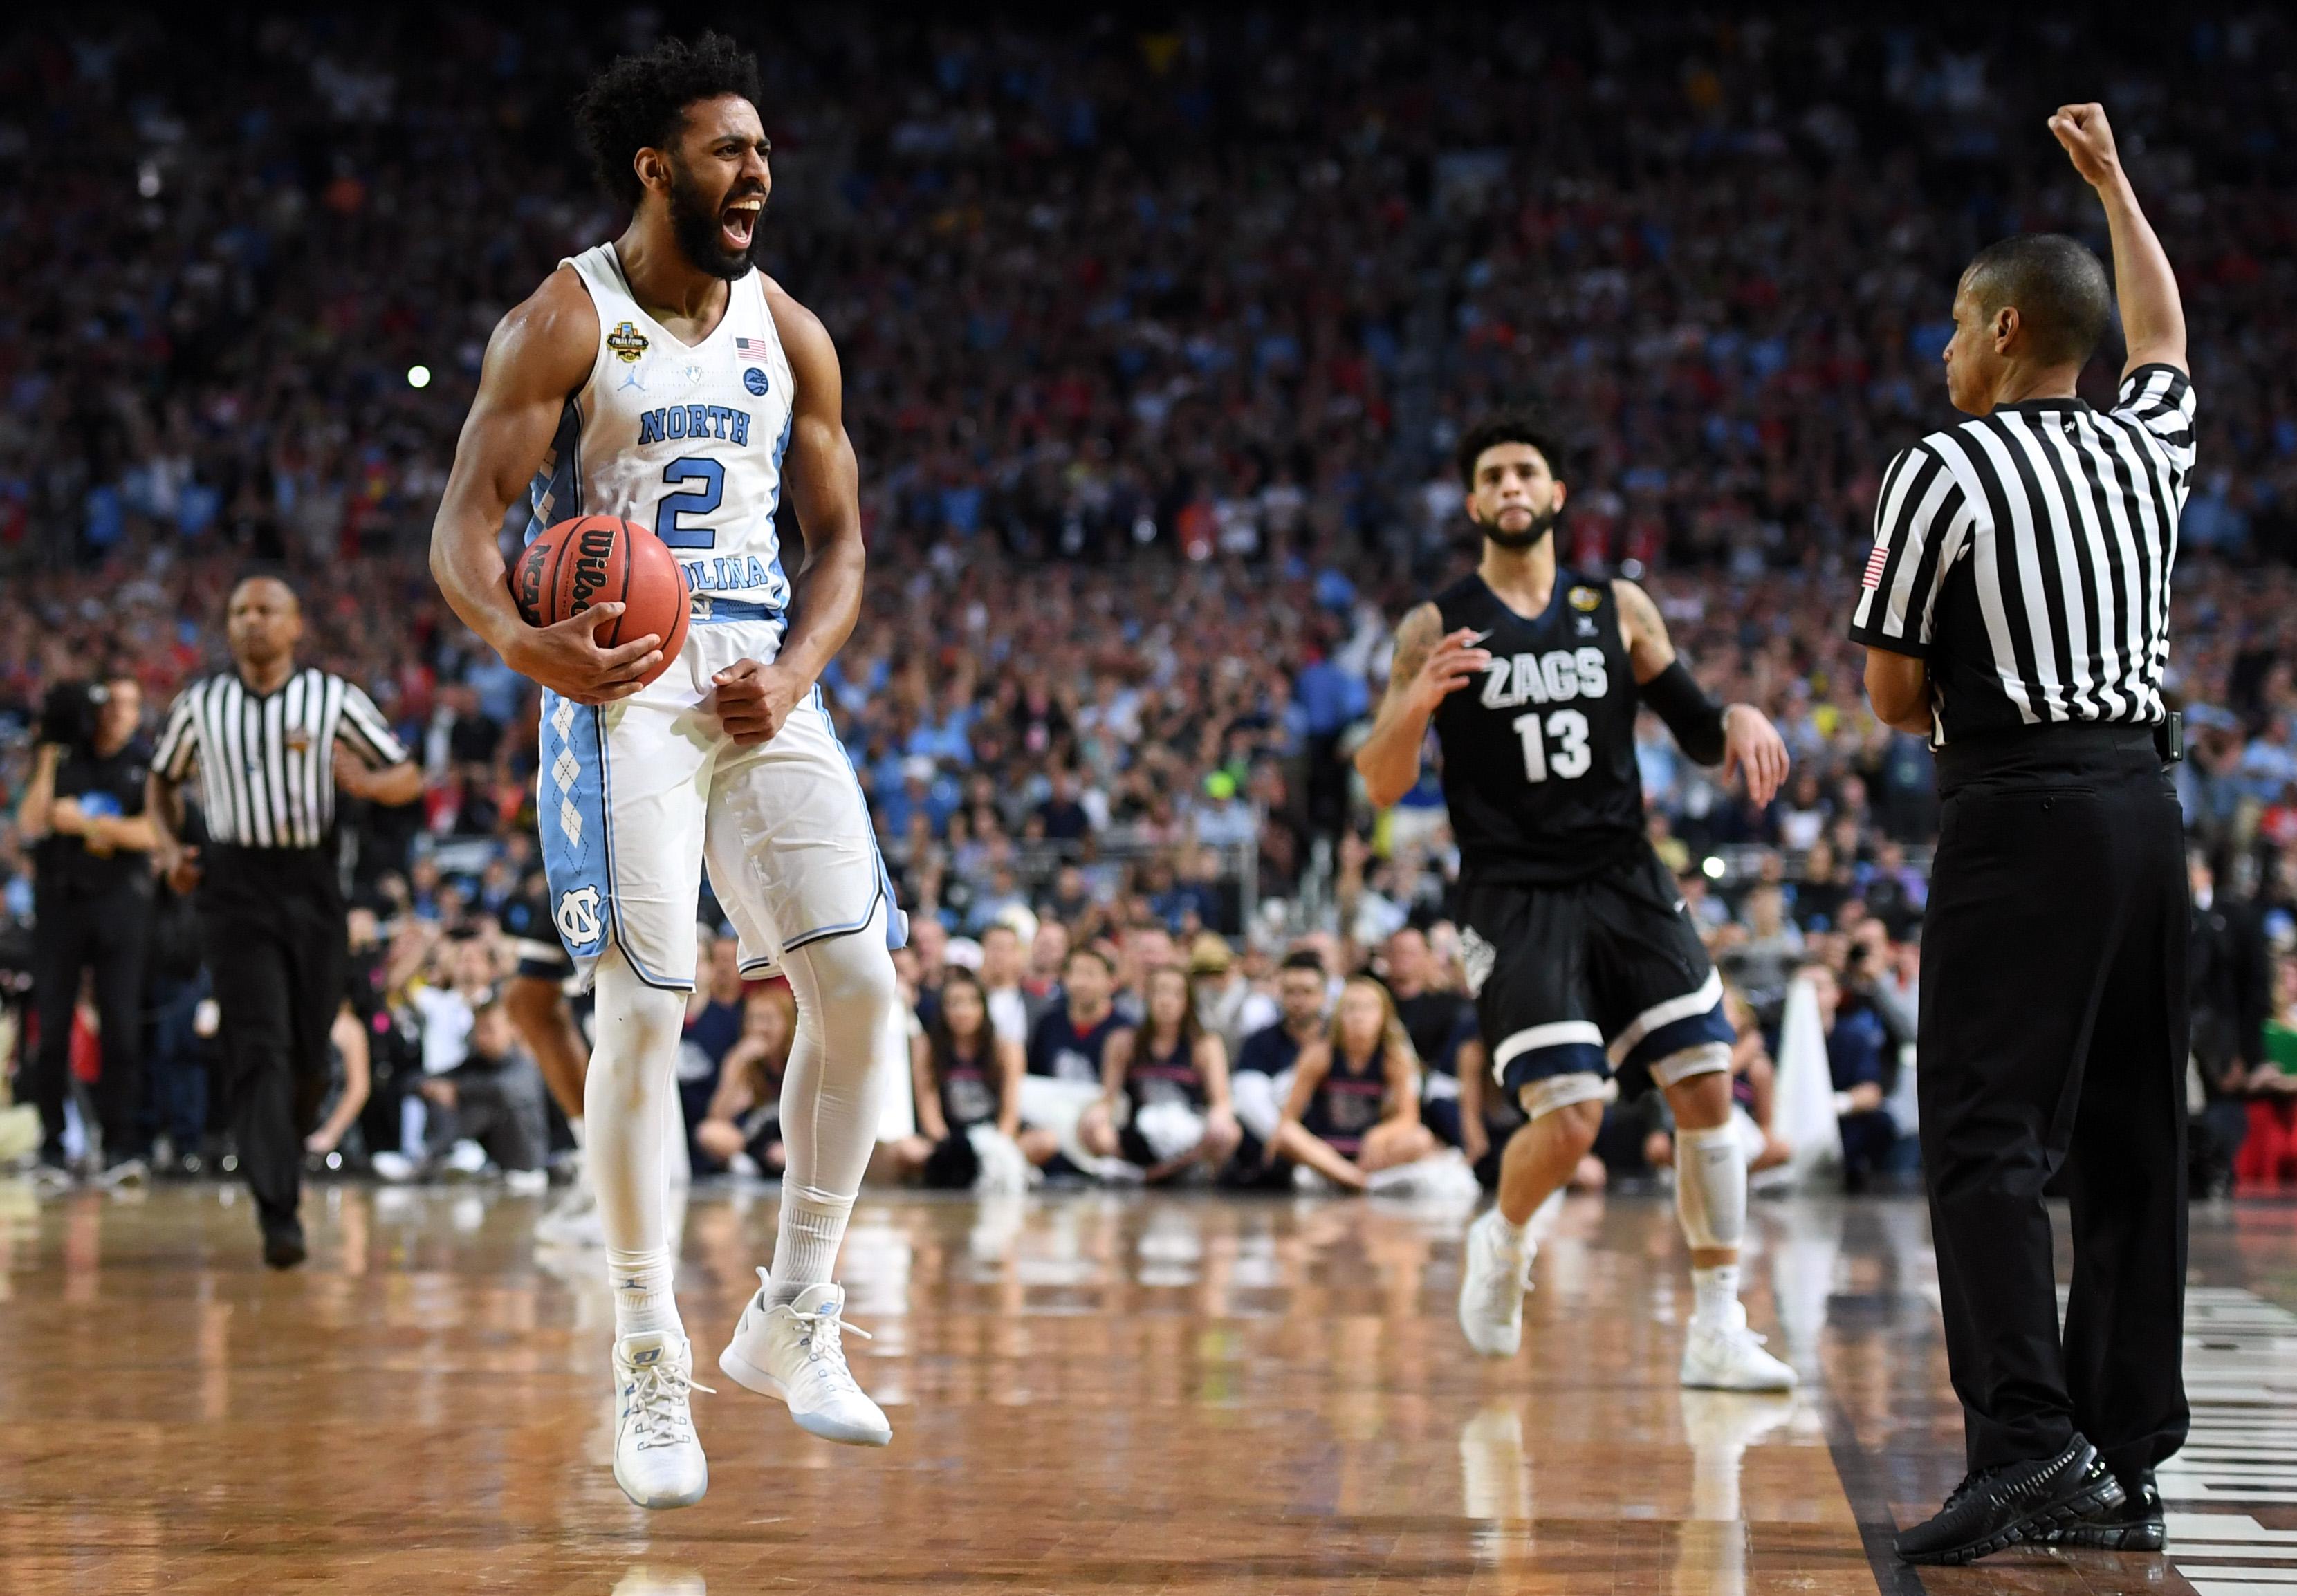 UNC Basketball: Joel Berry II 2016-2017 Season Review